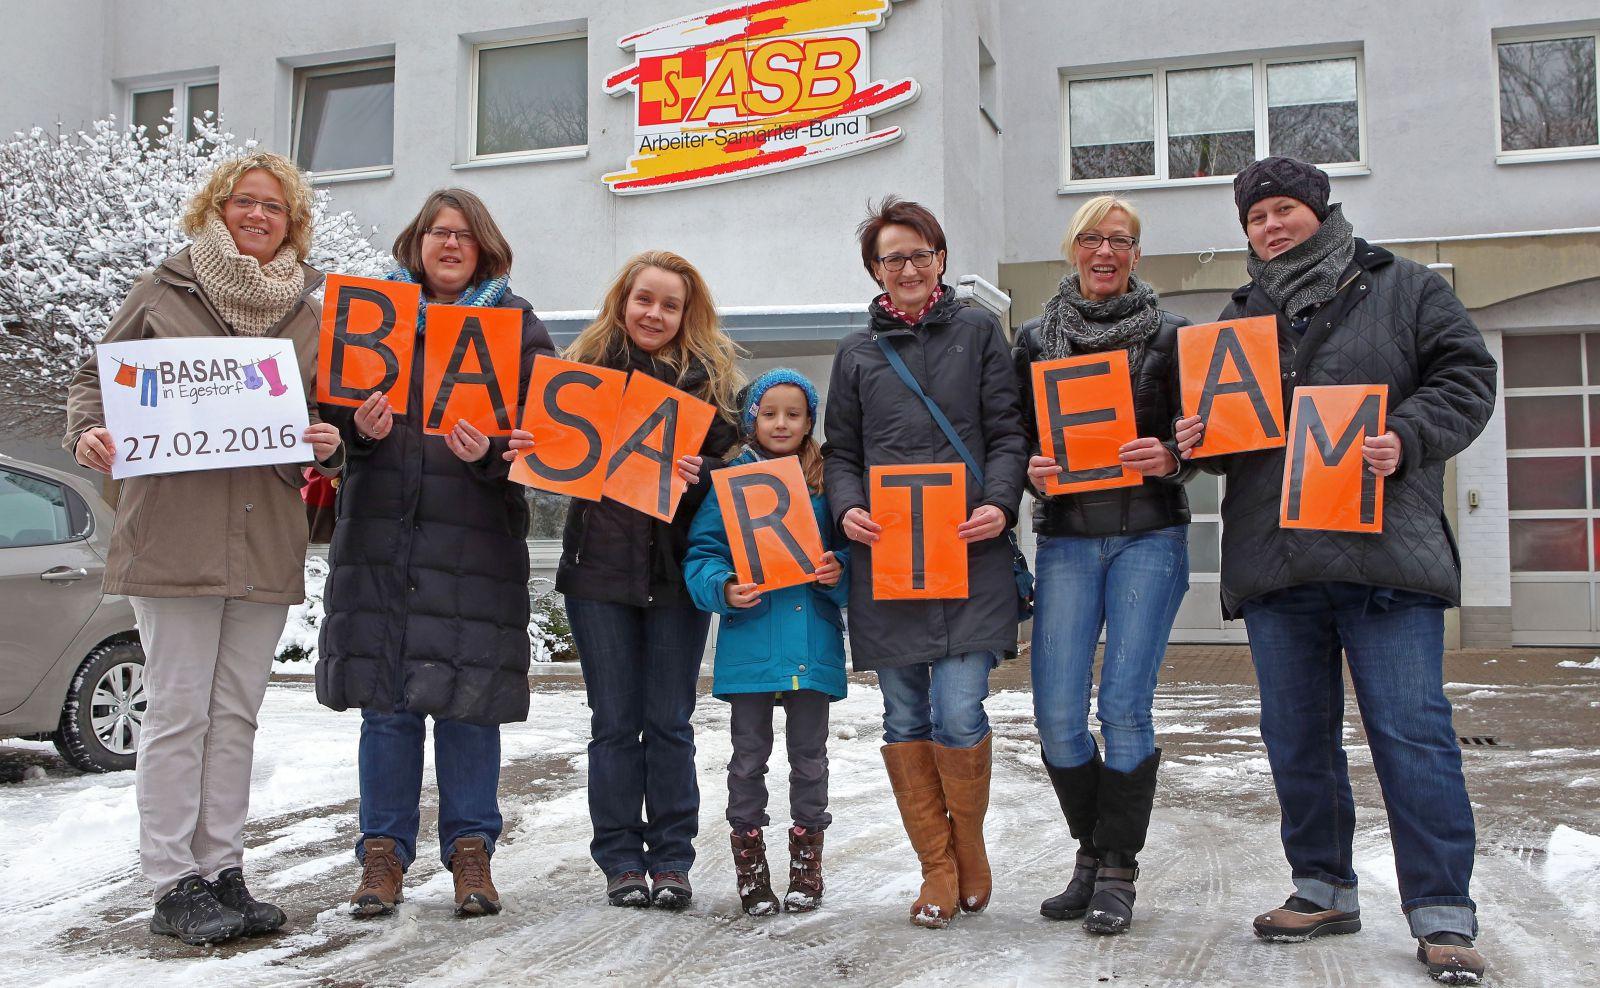 Basar-Team für VA 27. Februar 2016 Foto 01